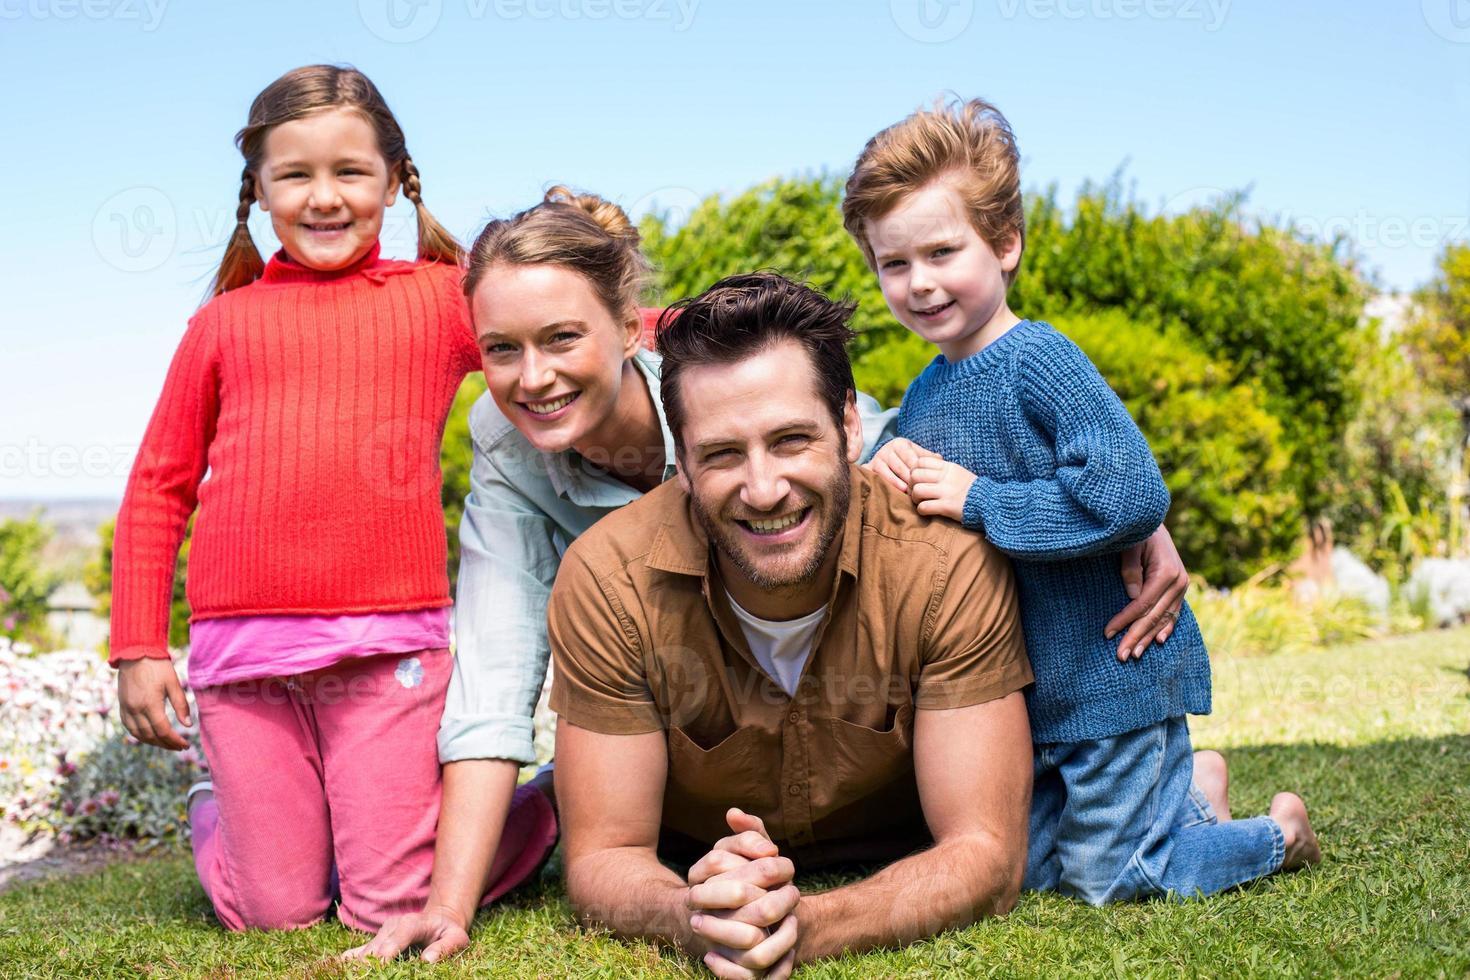 famille heureuse, sourire, appareil-photo photo